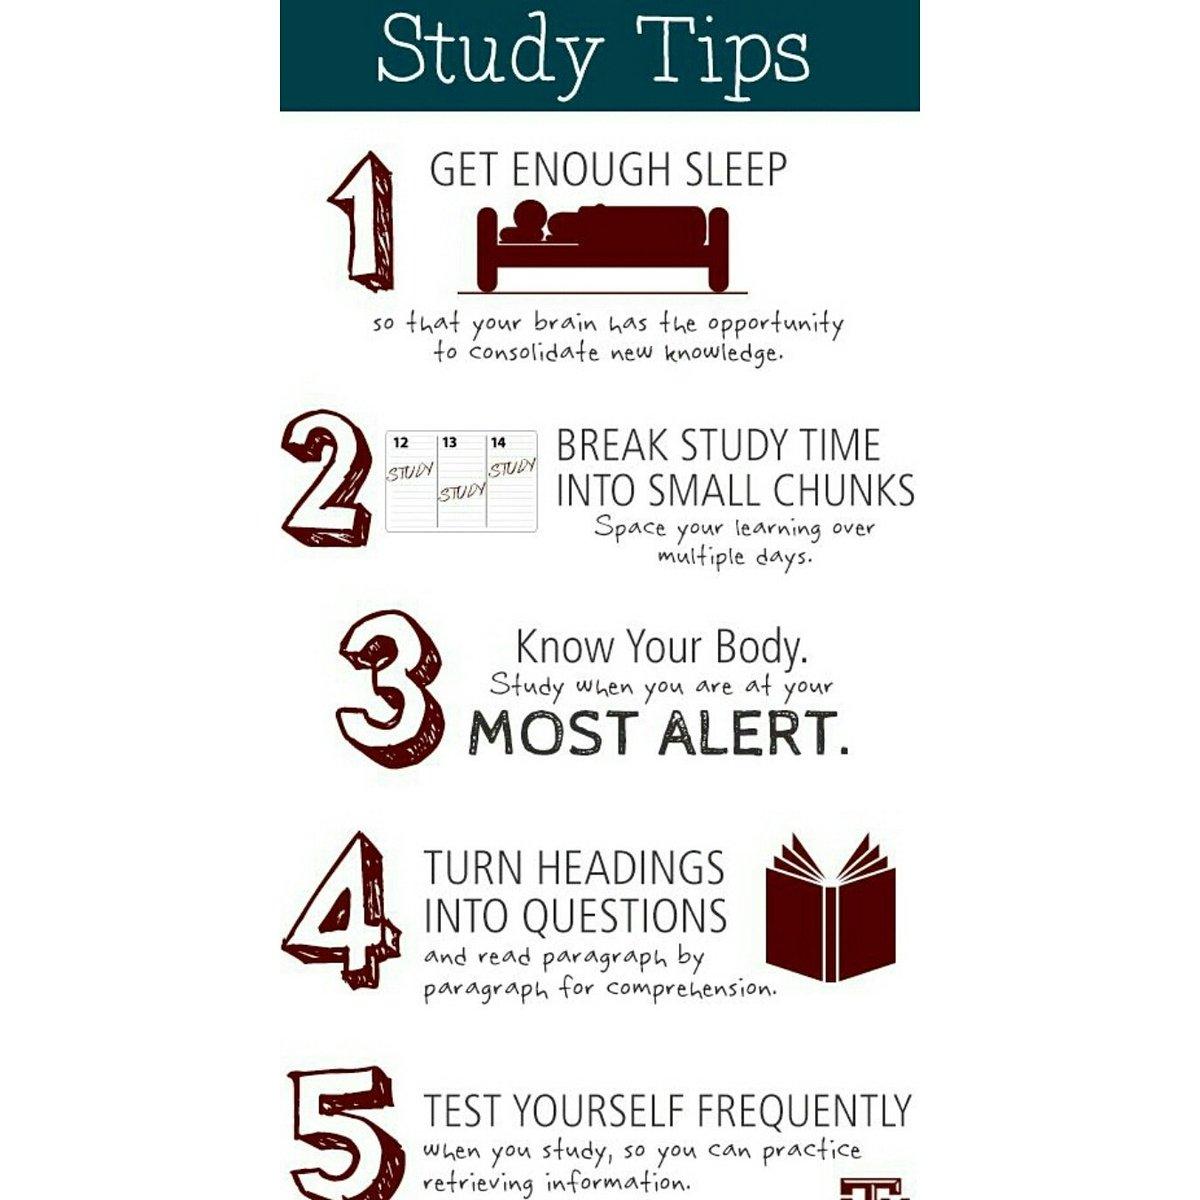 How do i study for midterms?